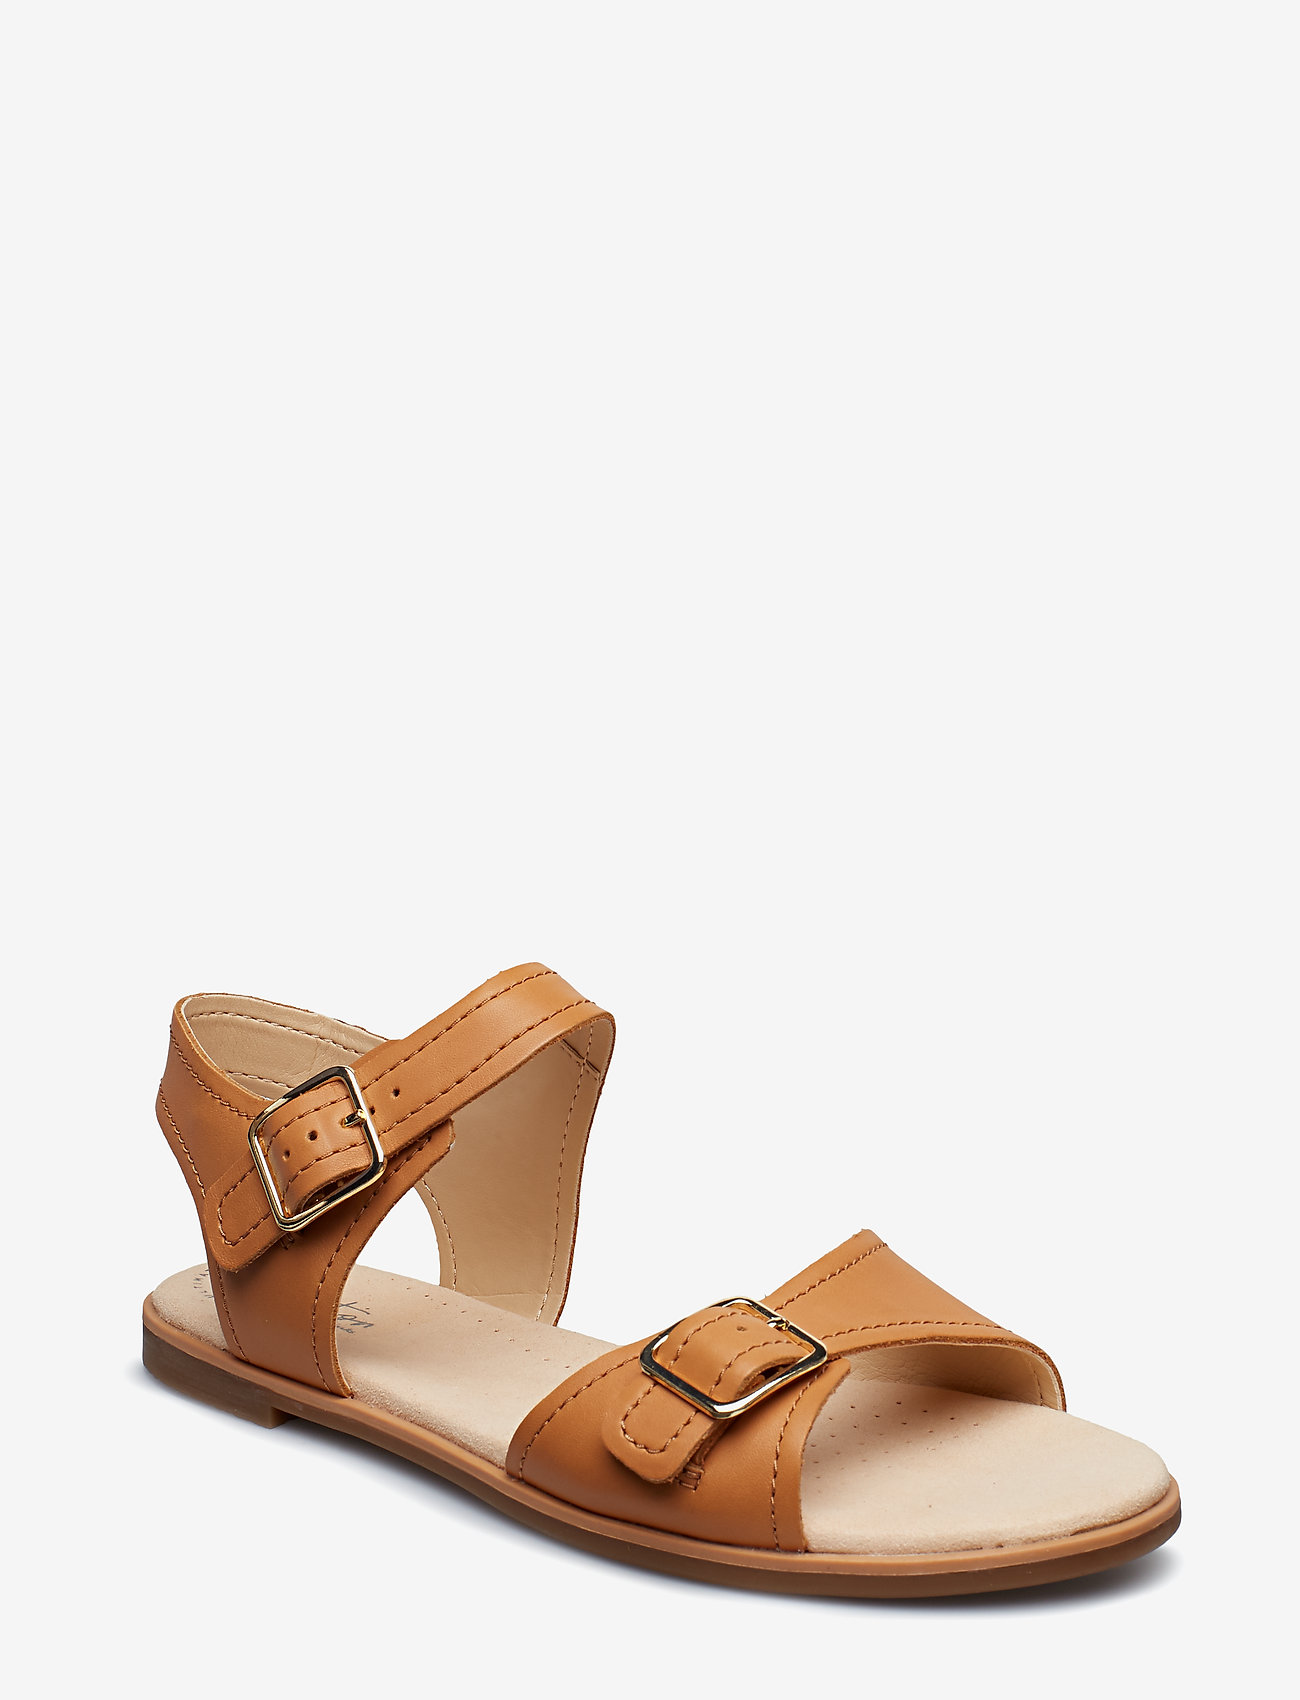 Clarks - Bay Primrose - platta sandaler - light tan lea - 0